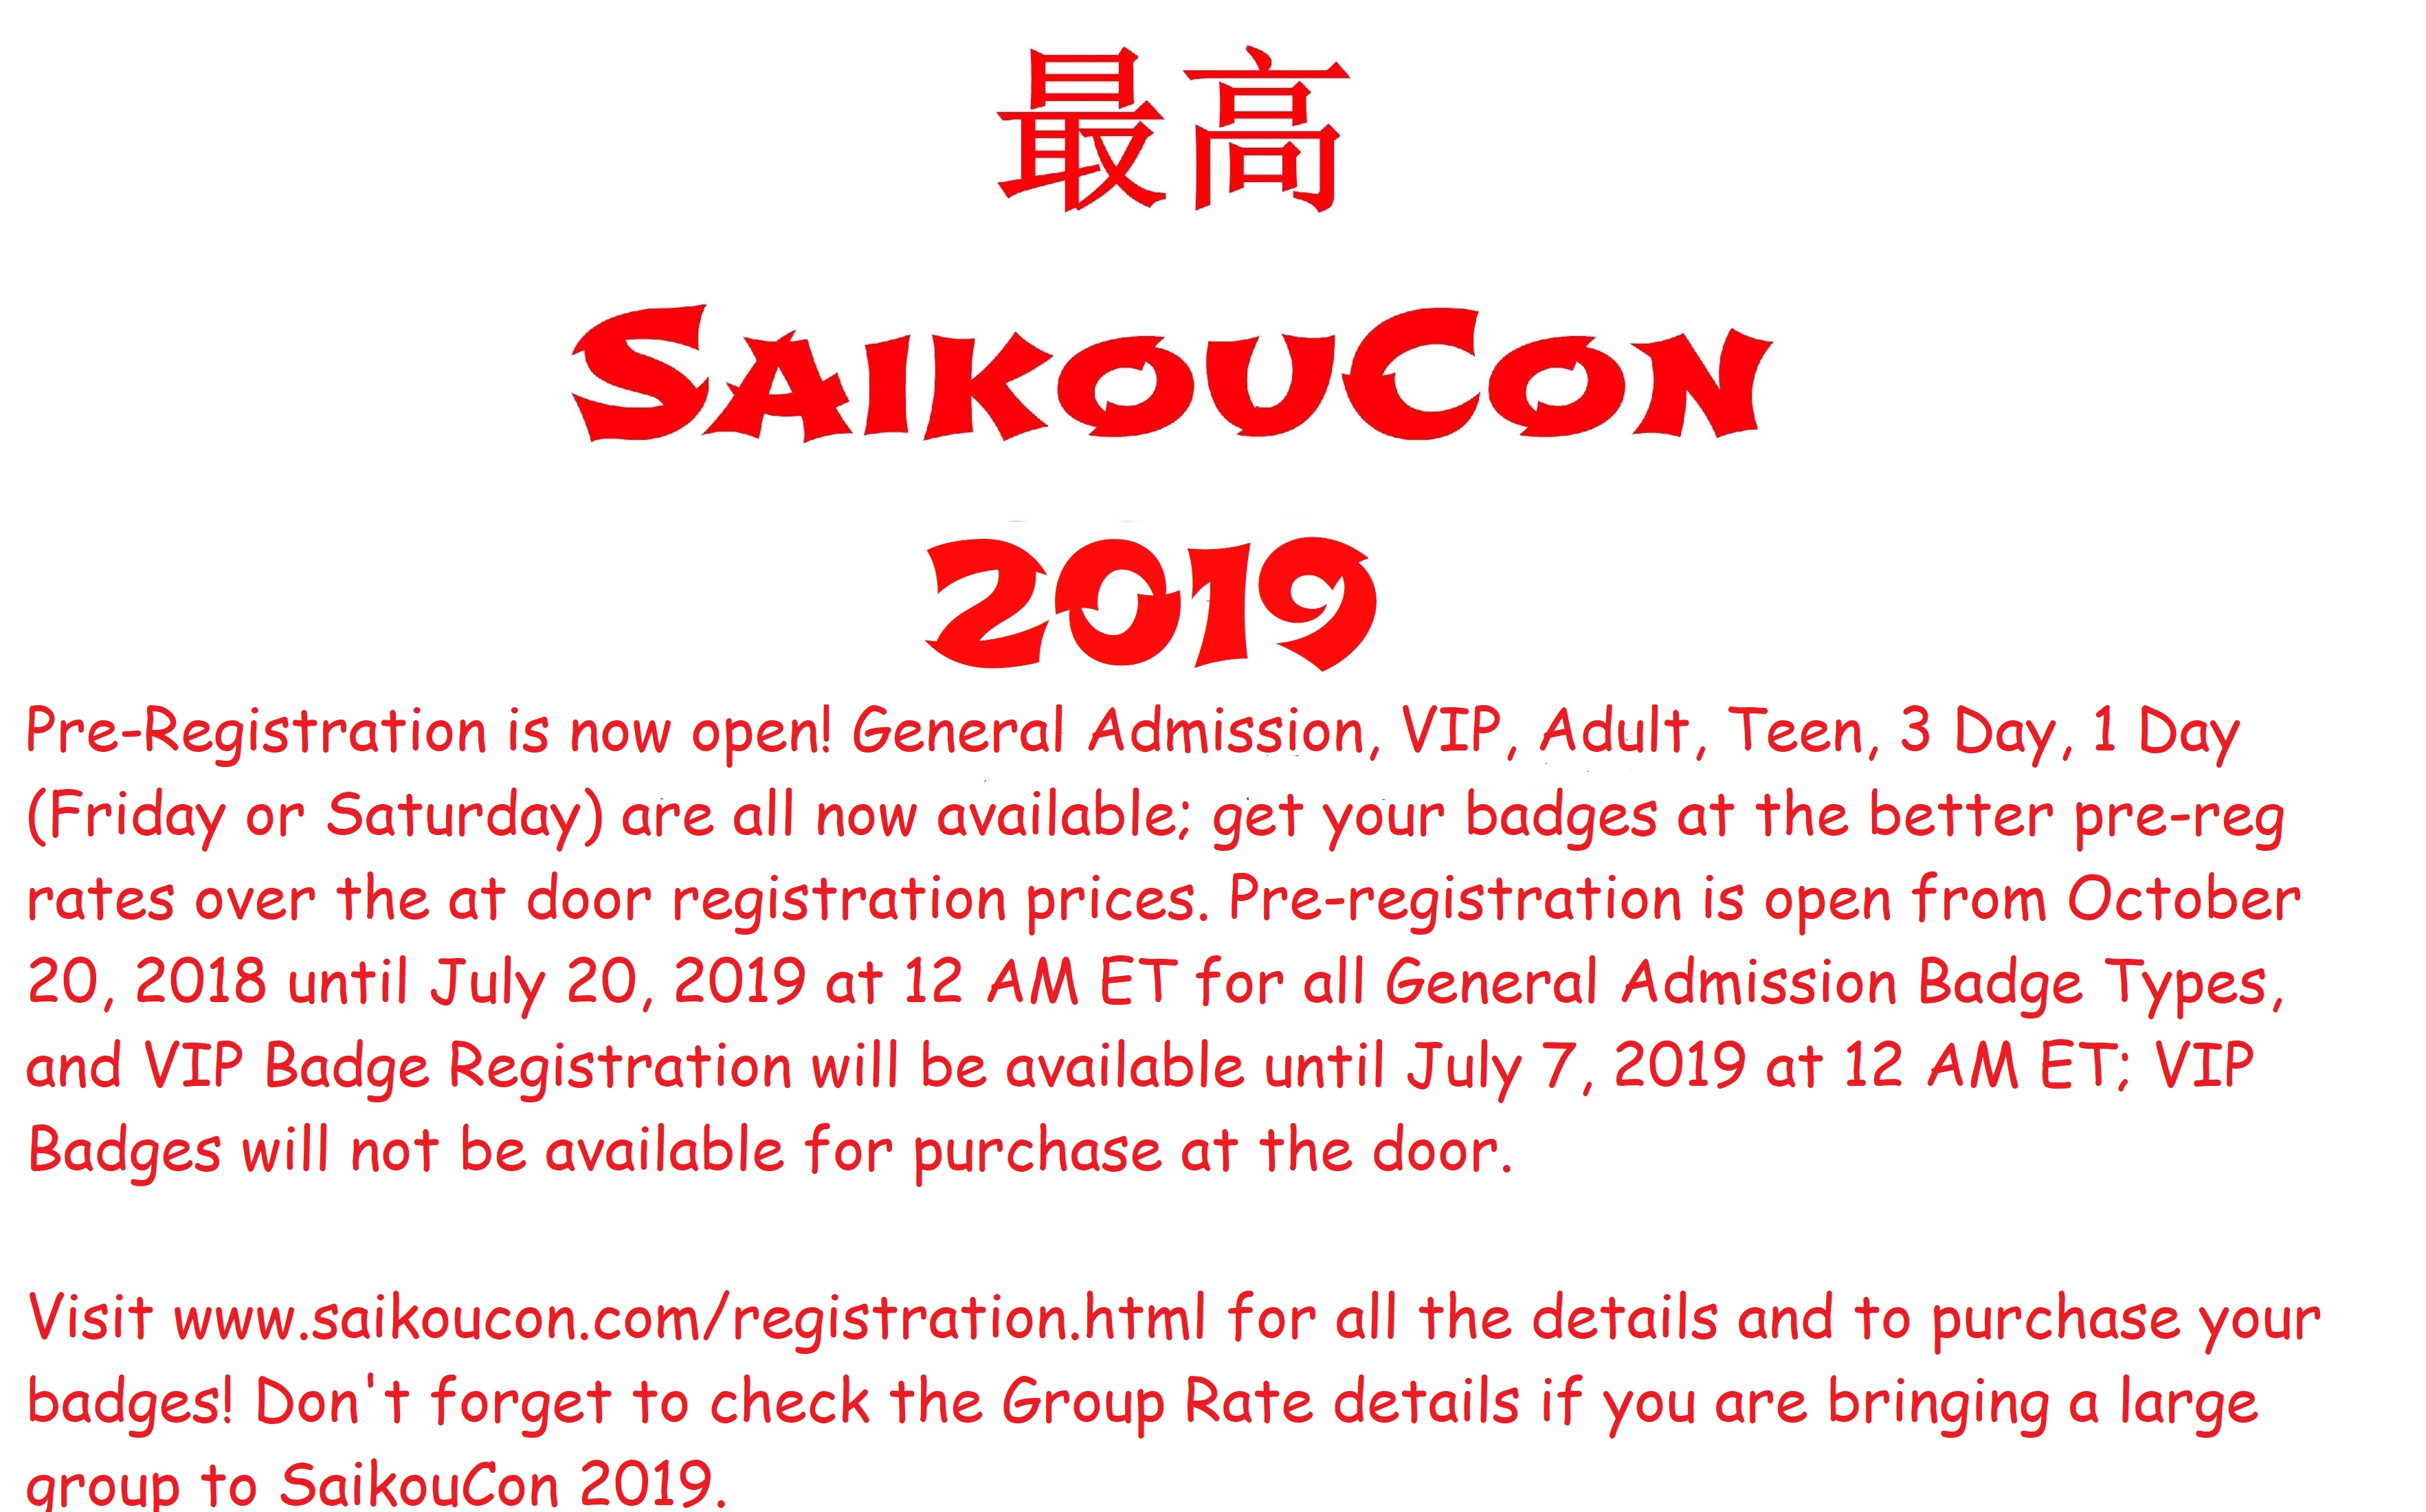 SaikouCon 2019 Pre-Registration is Open